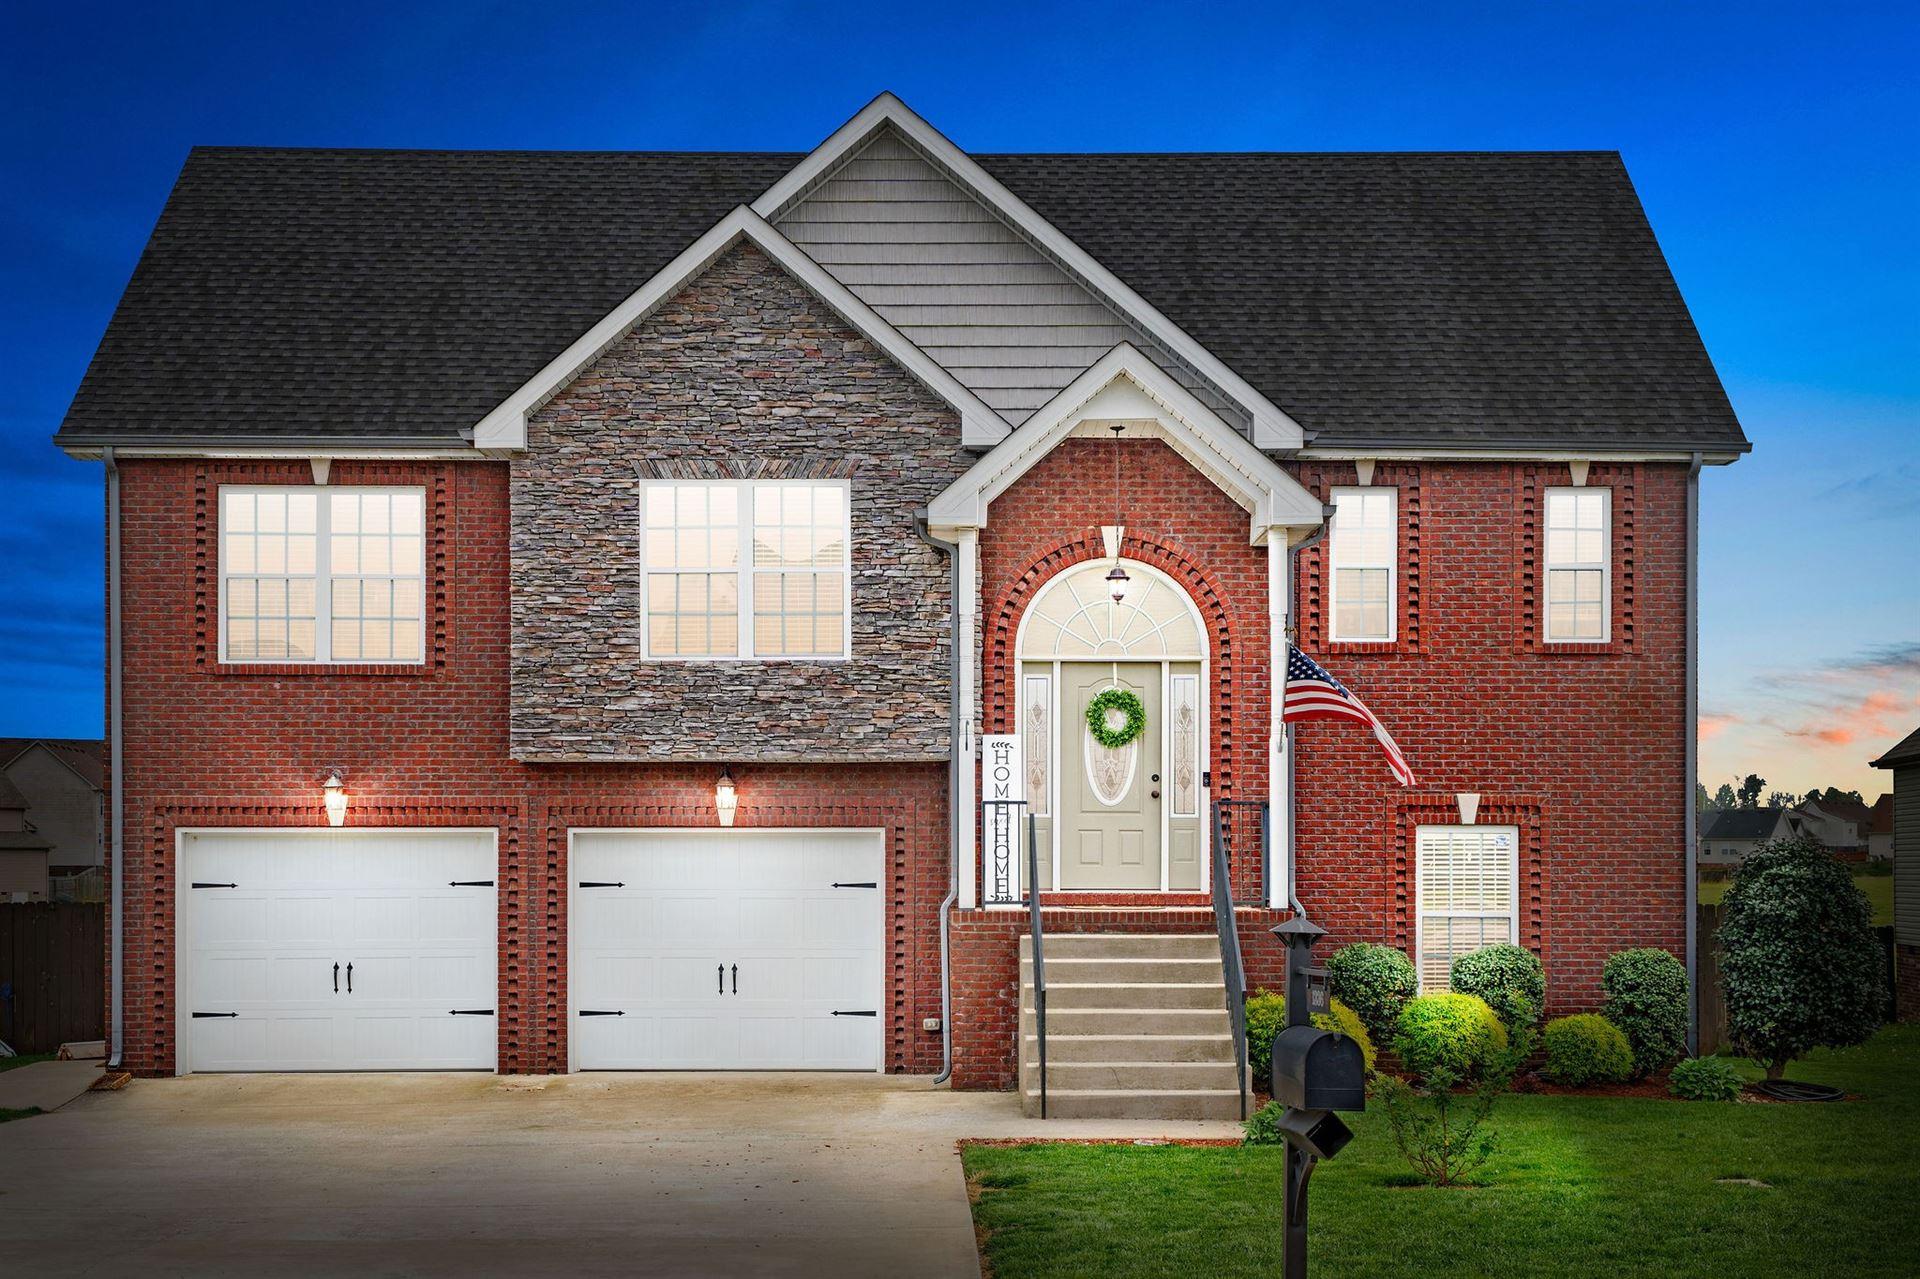 1336 Canyon Pl, Clarksville, TN 37042 - MLS#: 2245087